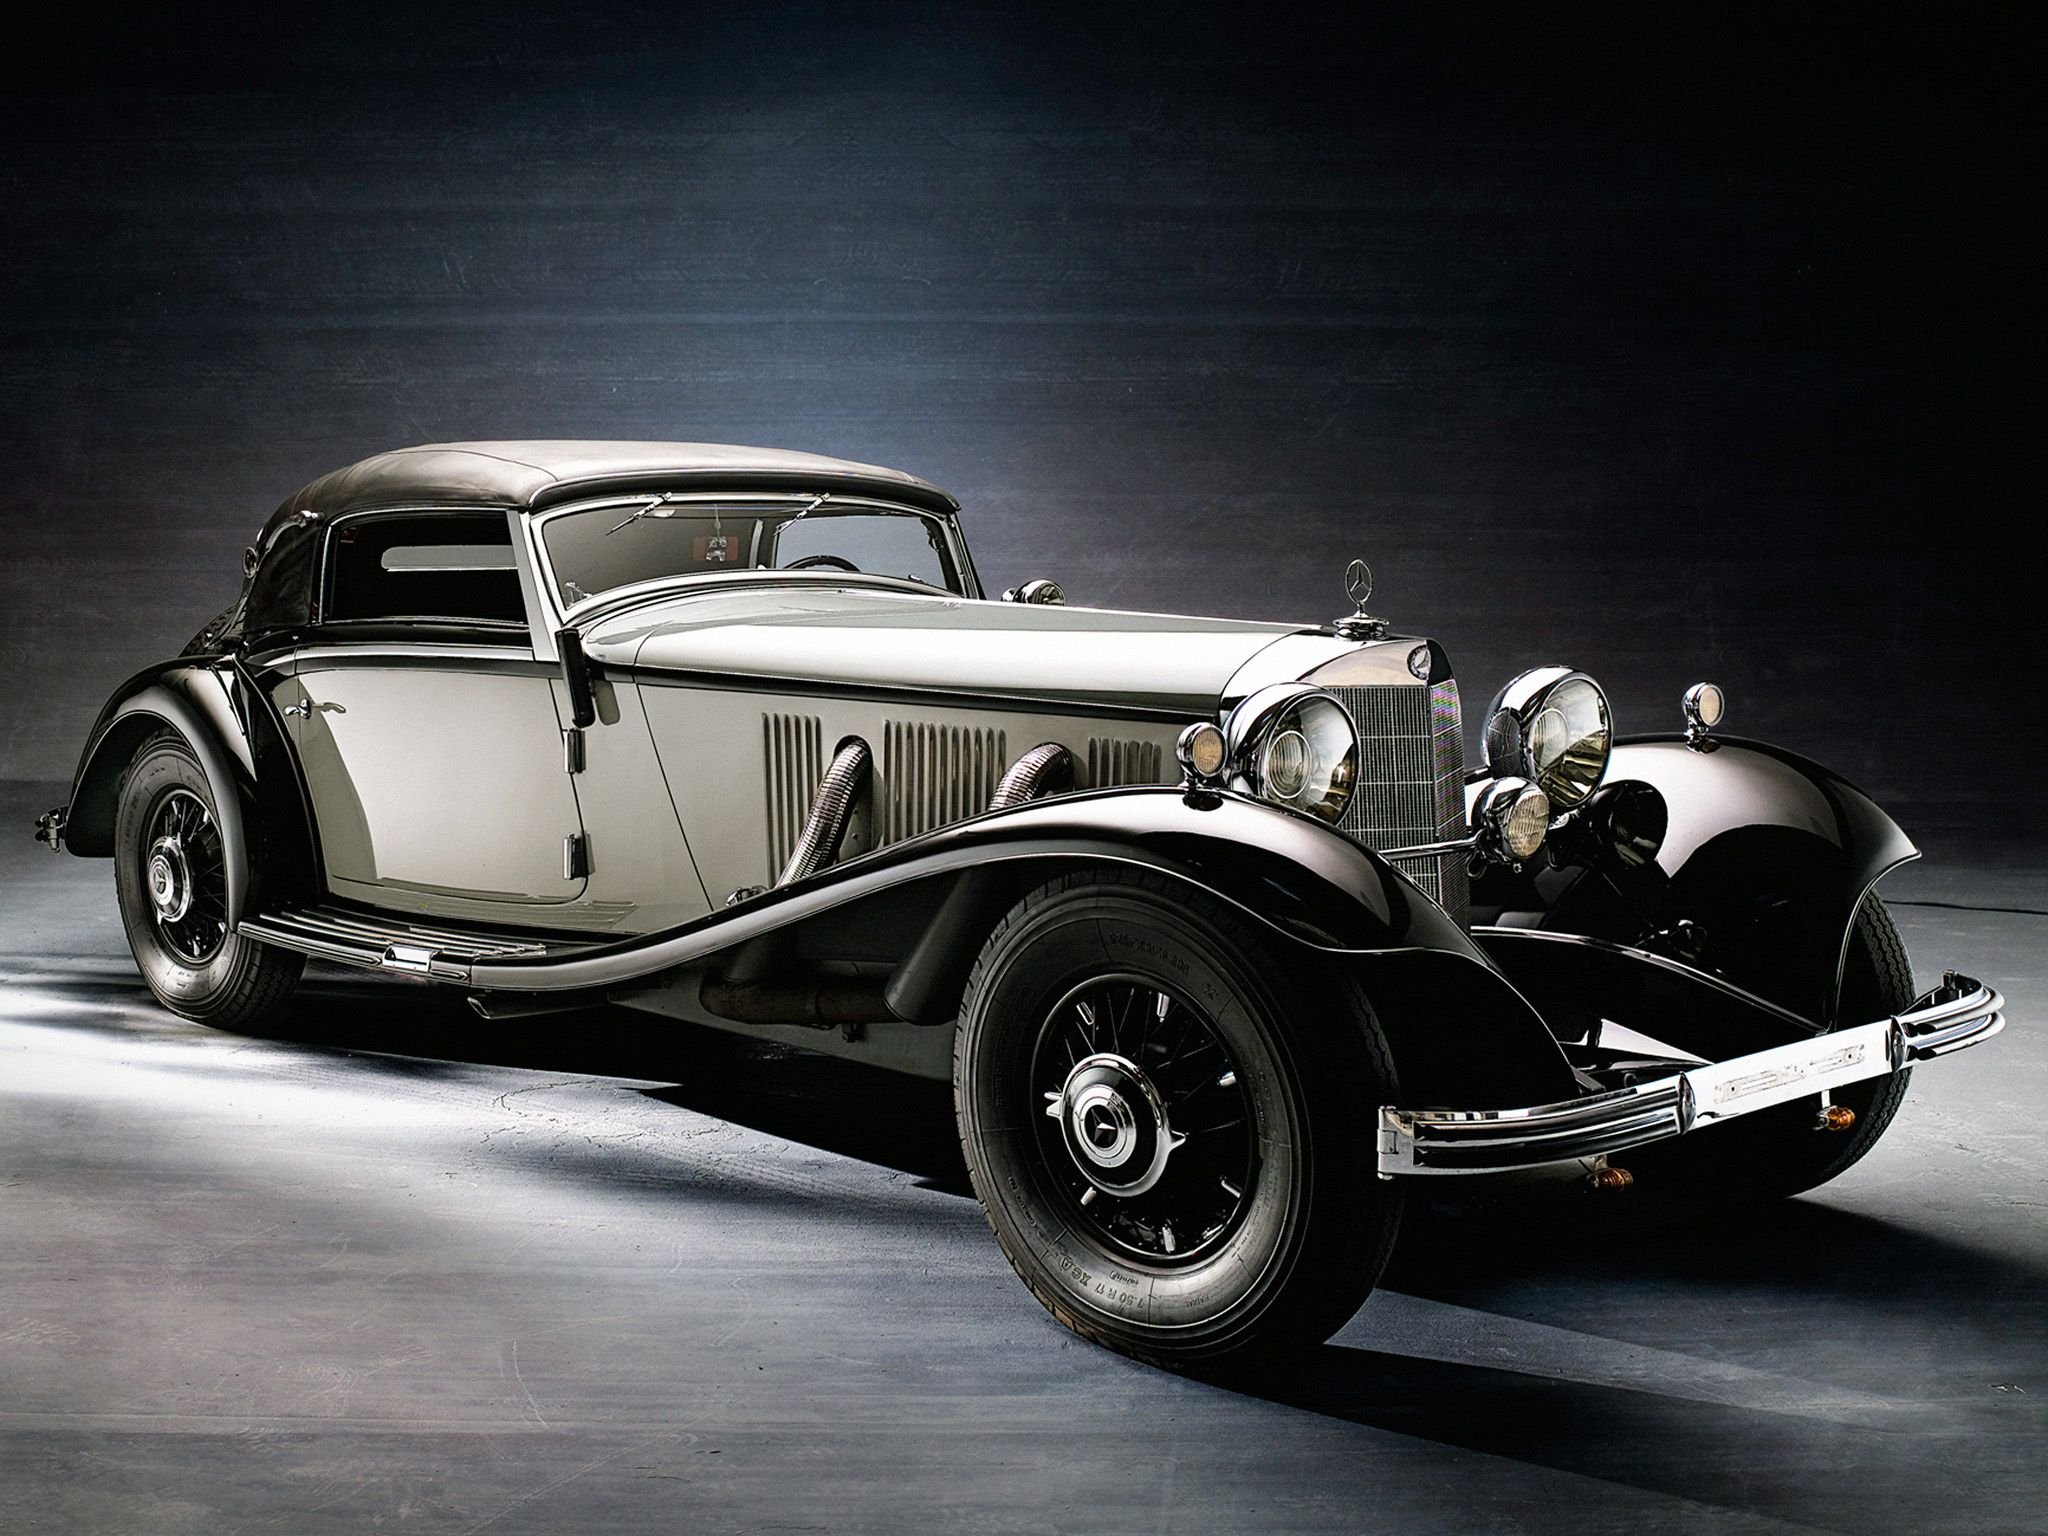 1935 mercedes benz 500k cabriolet with images